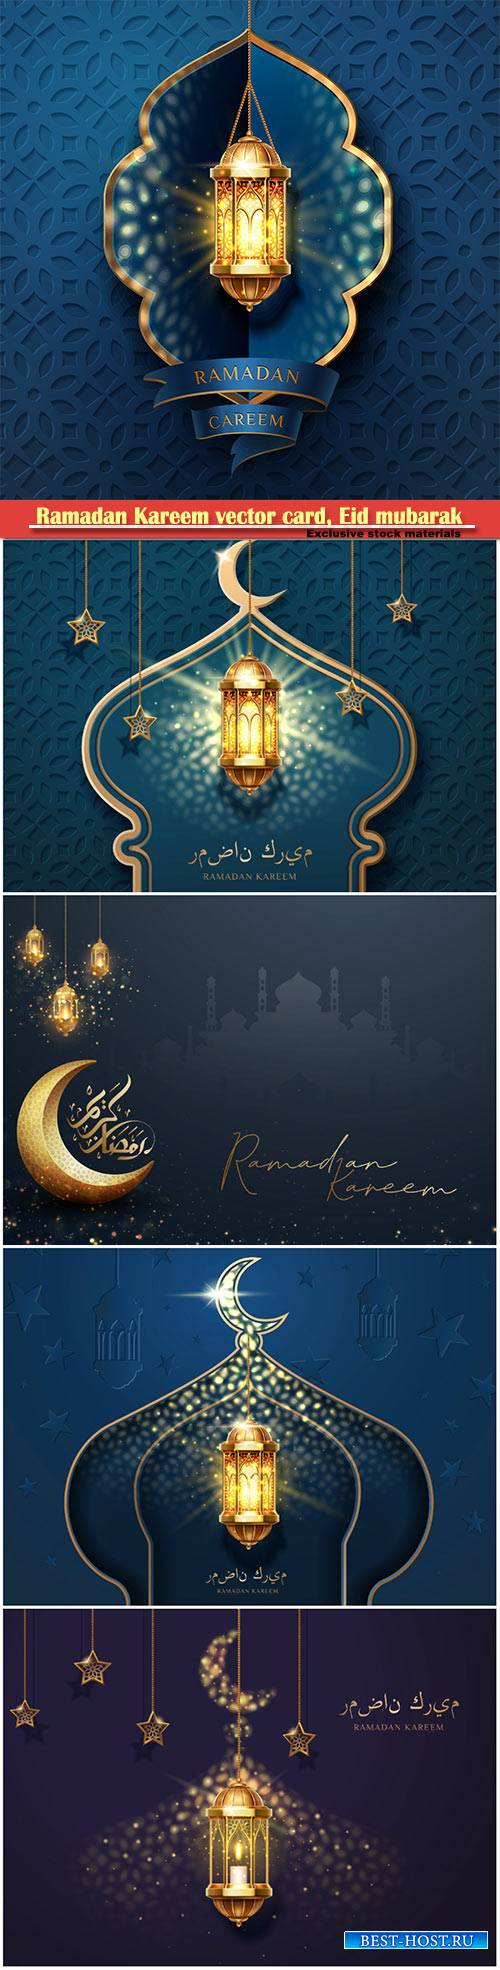 Ramadan Kareem vector card, Eid mubarak calligraphy design templates # 26